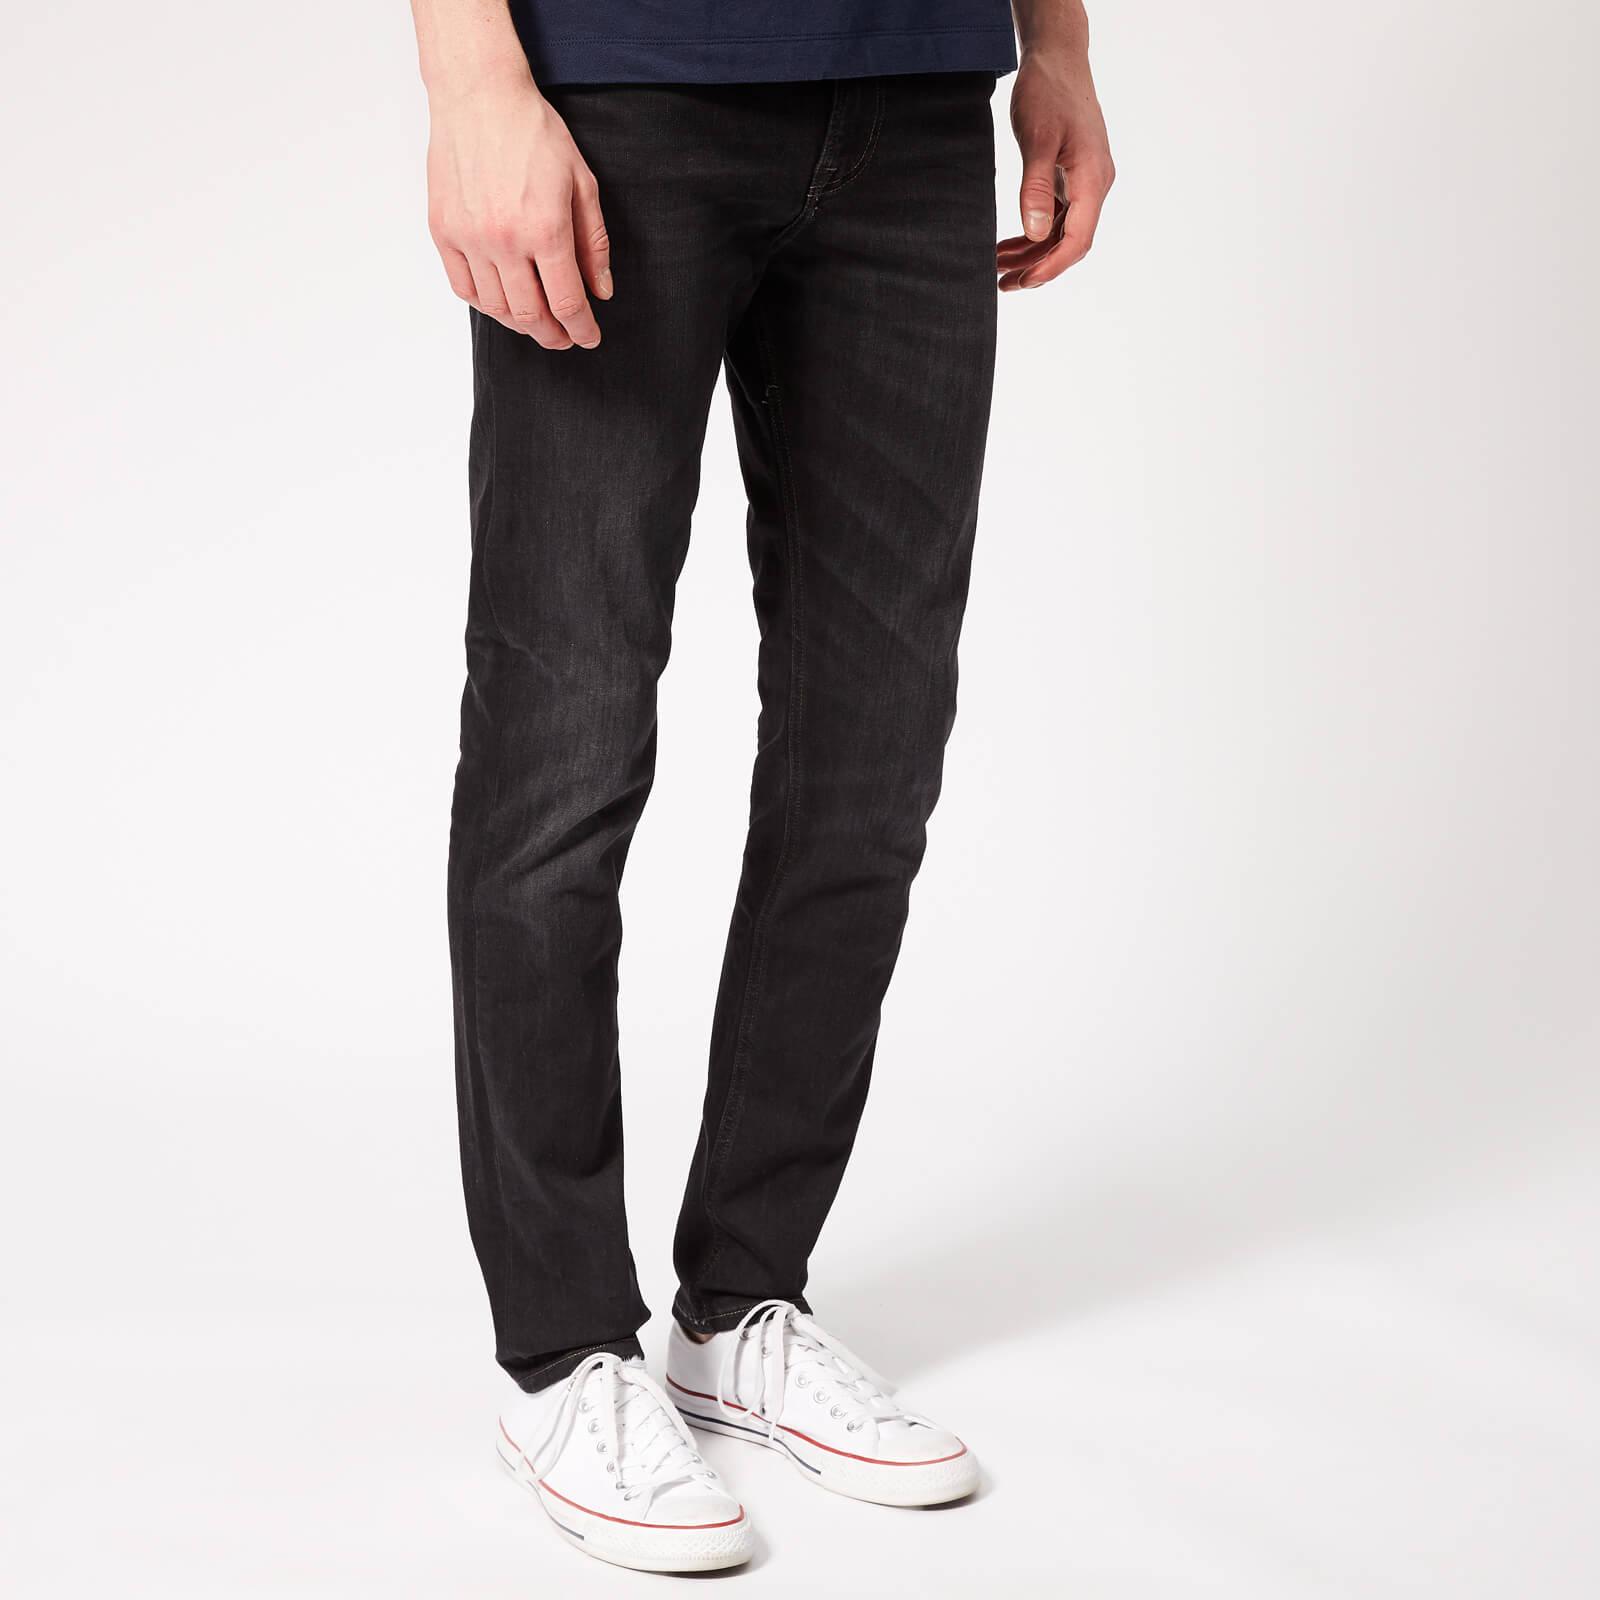 dde669cc Tommy Jeans Men's Skinny Simon Jeans - Vernon Black Stretch Mens Clothing |  TheHut.com